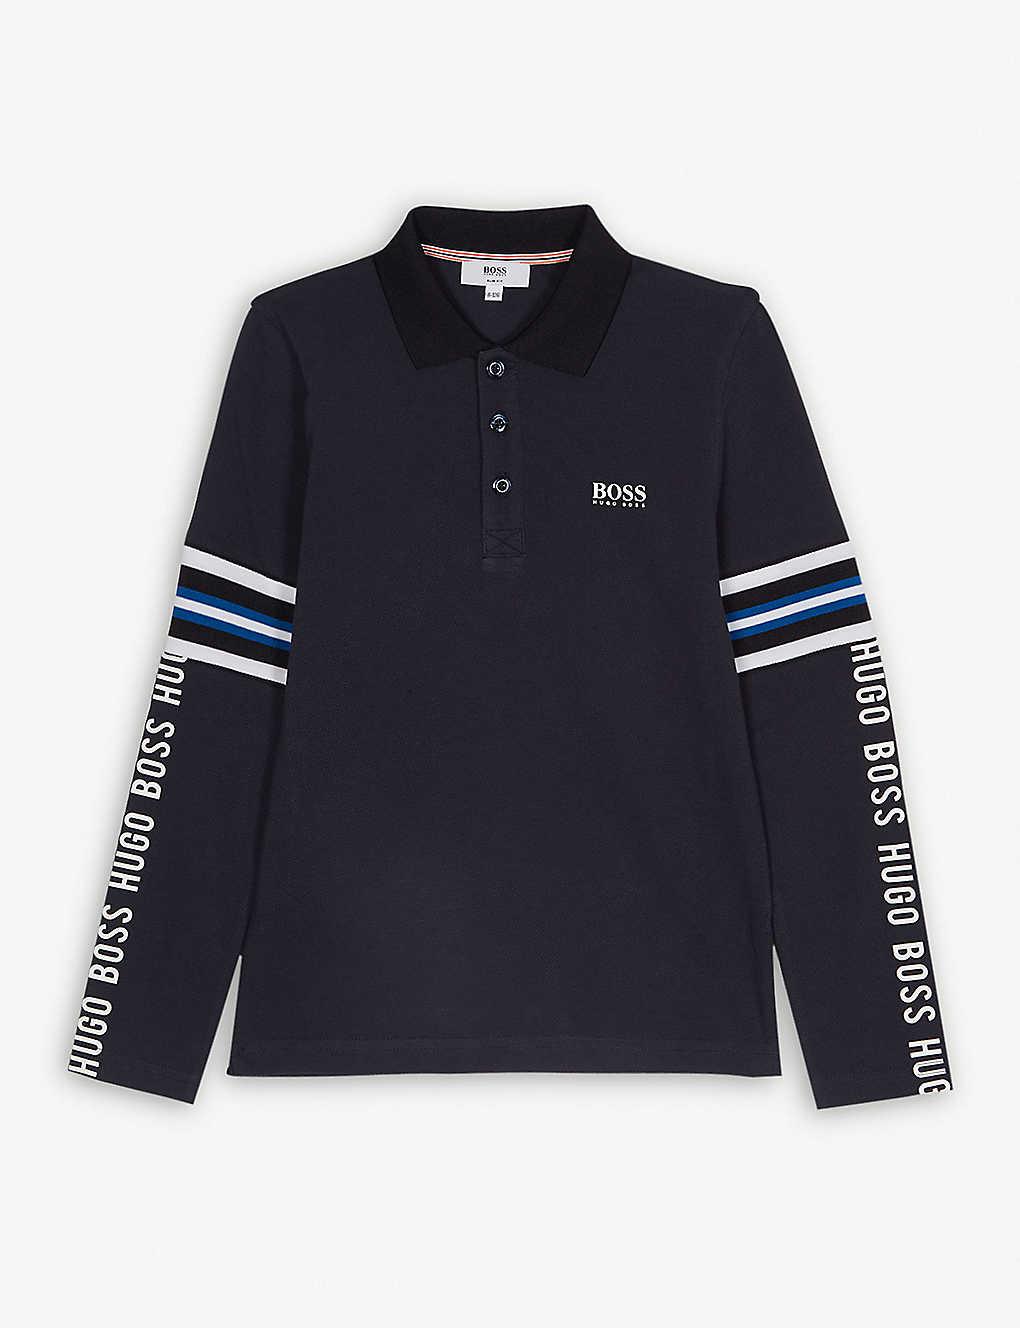 31142e0c2 BOSS - Tape logo cotton polo sweatshirt 4-16 years | Selfridges.com